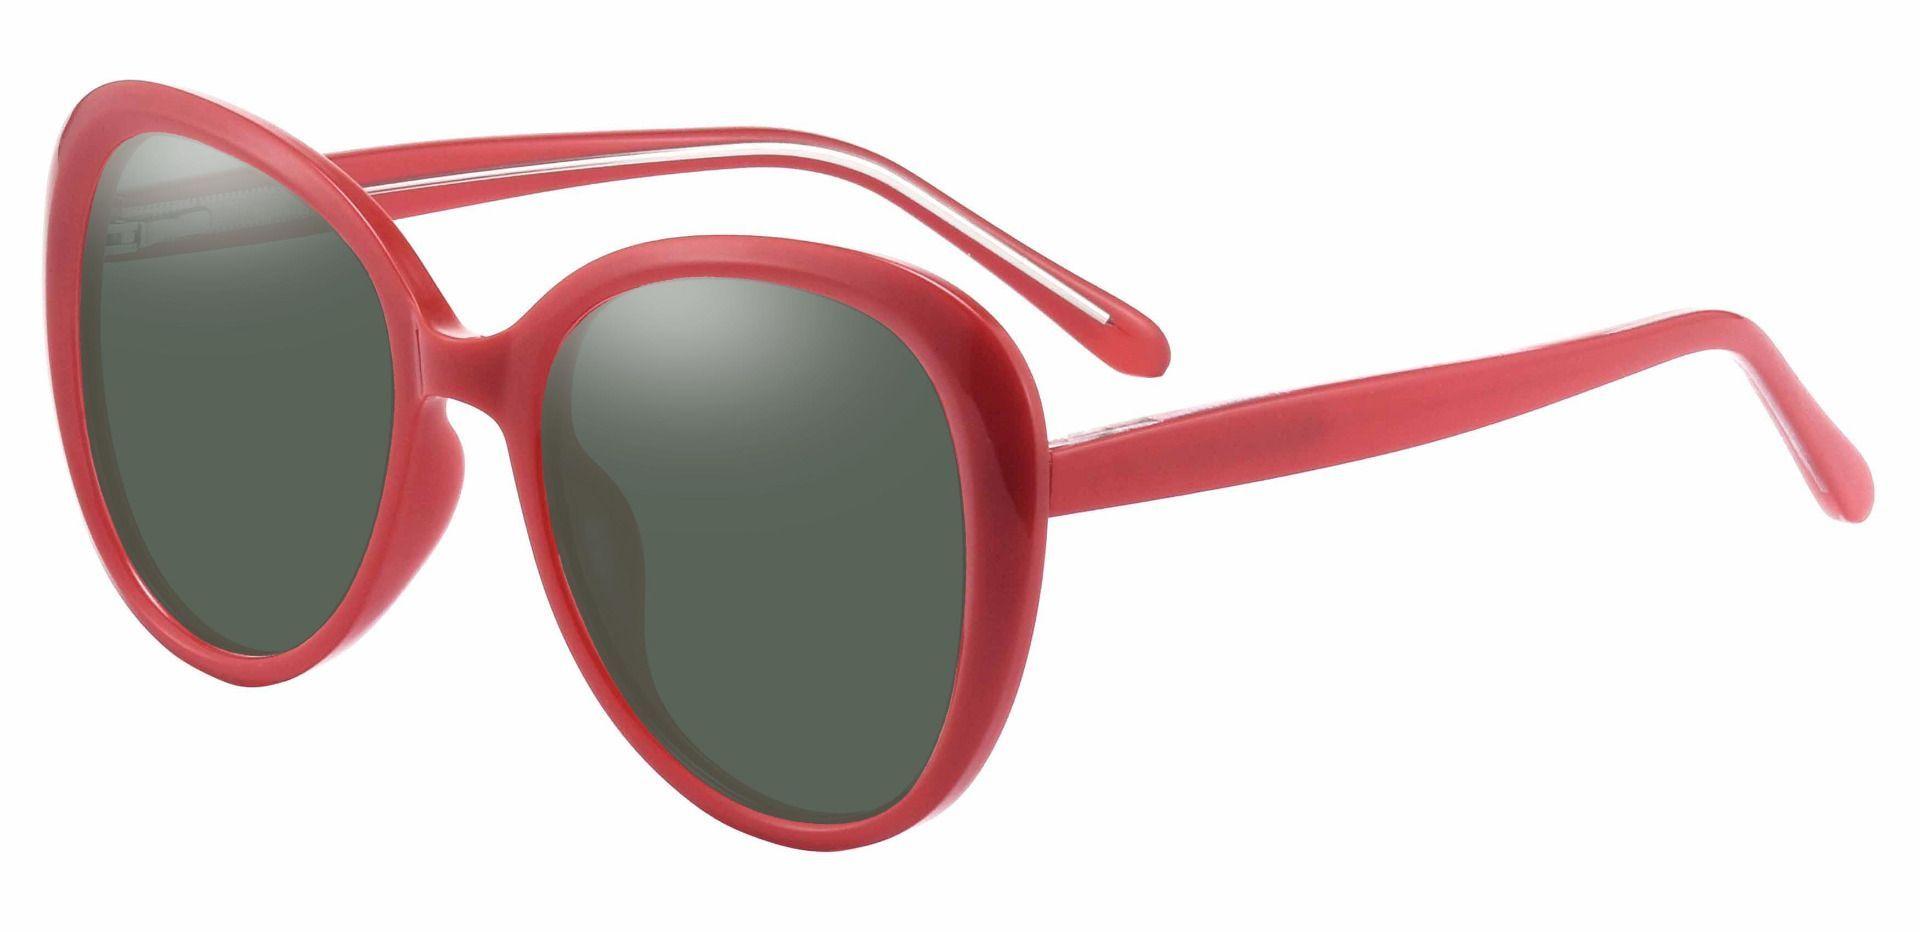 Sheridan Oval Prescription Sunglasses - Red Frame With Green Lenses